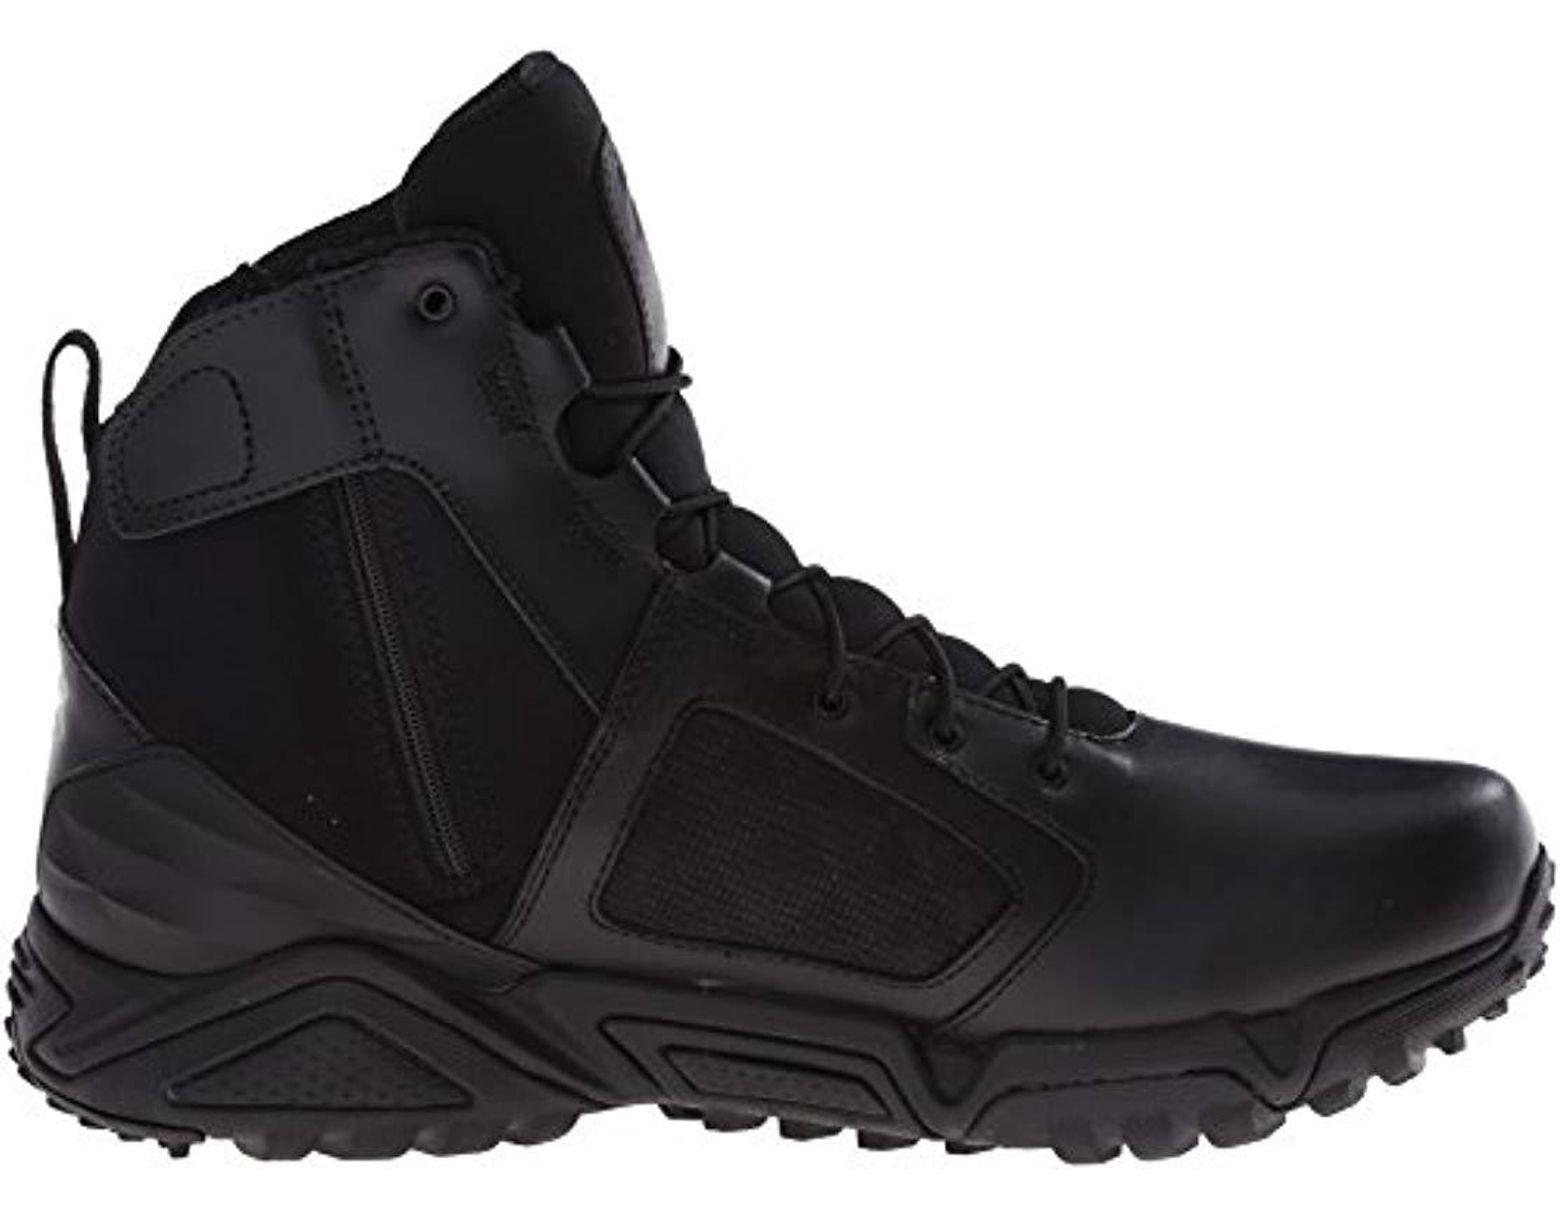 5ac85099c1d Men's Black Tac Zip 2.0 Military And Tactical Boot